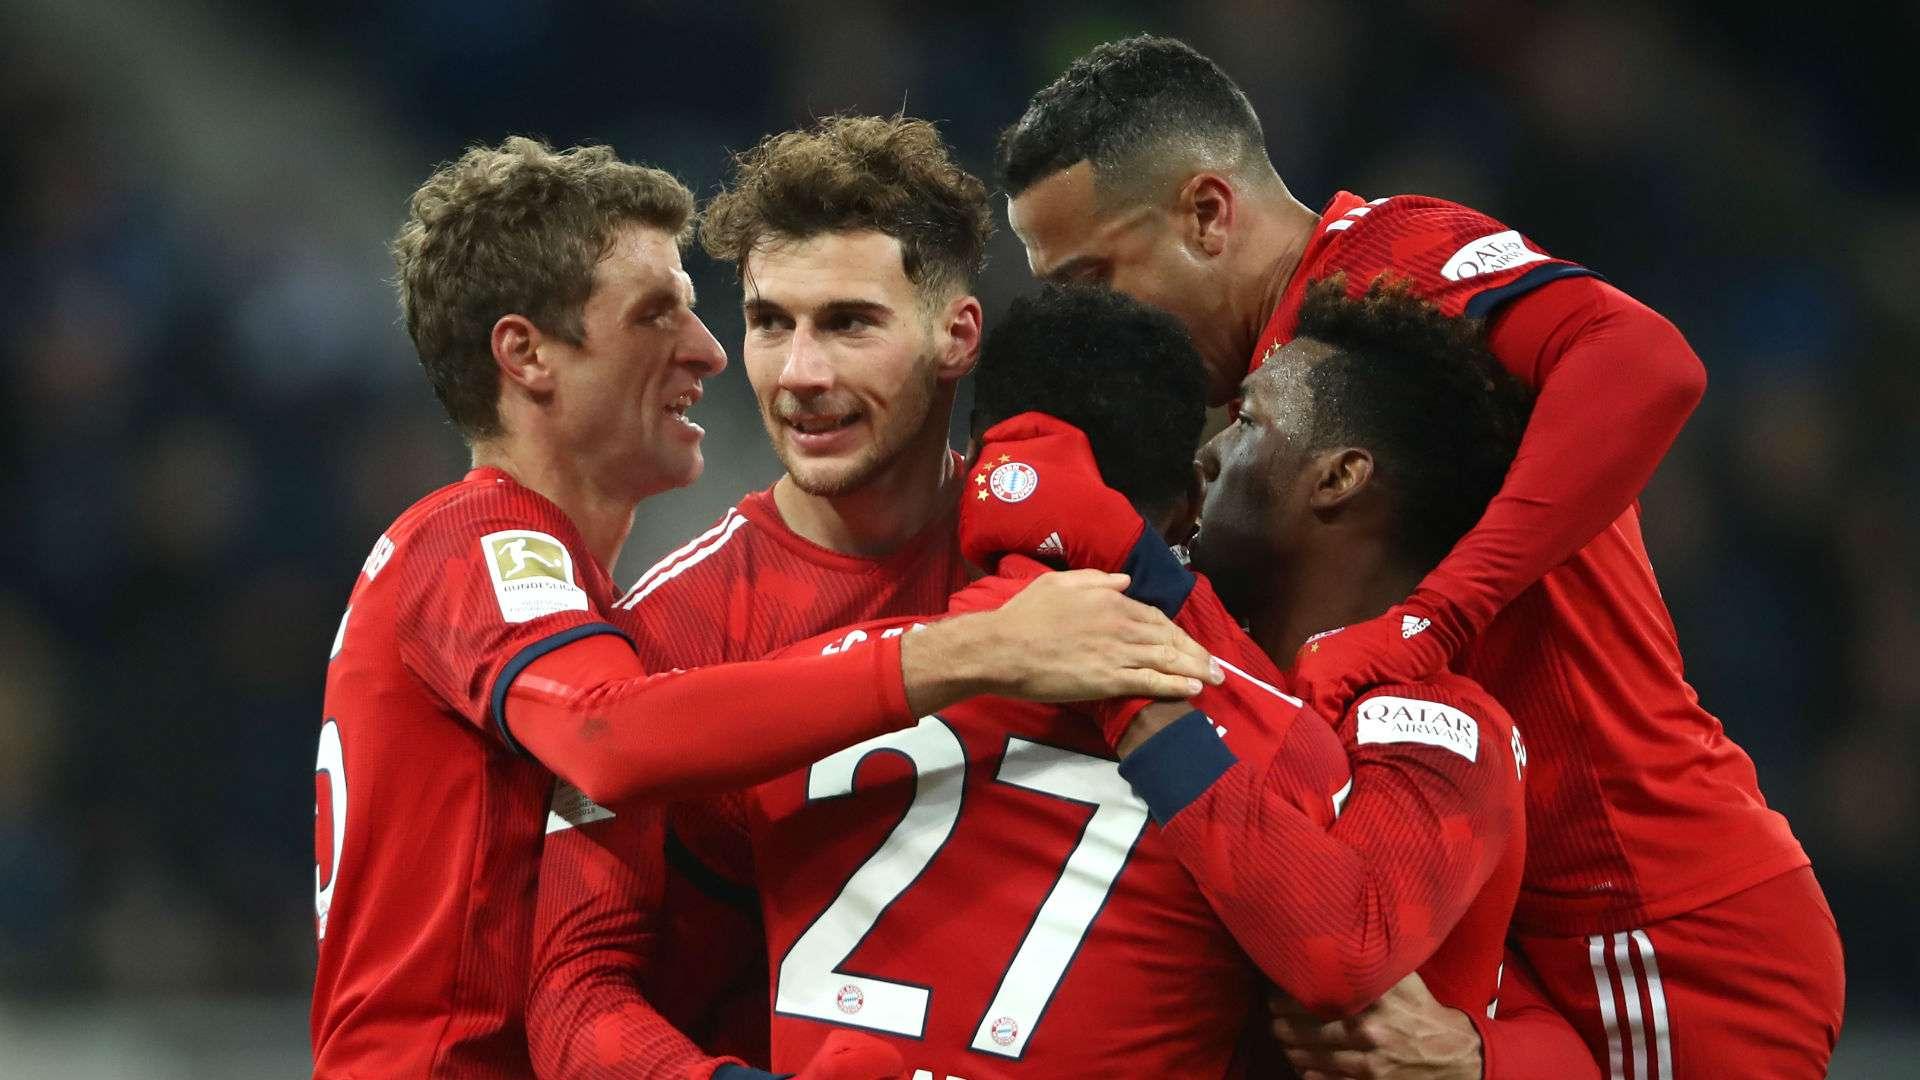 Bayern munich vs stuttgart betting previews intertrader spread betting